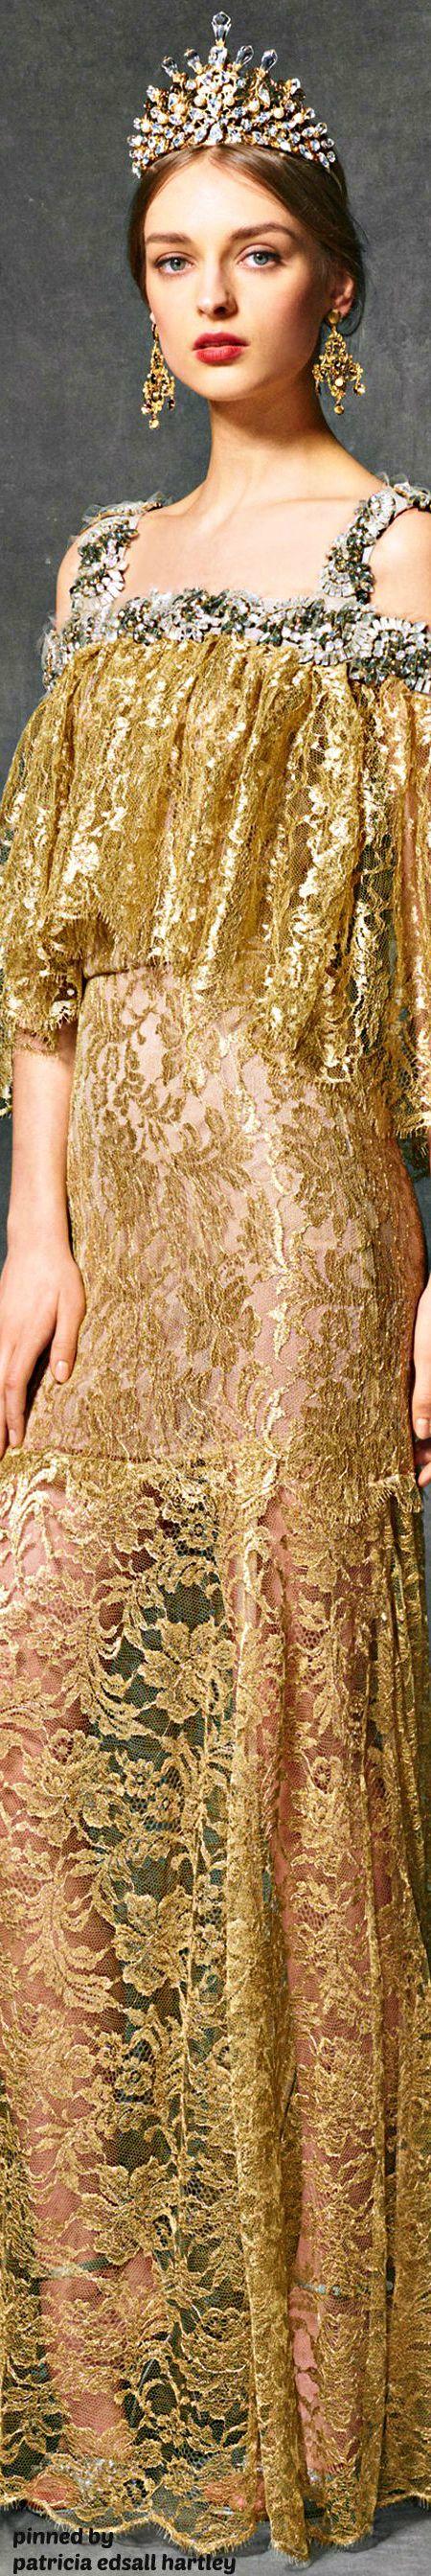 940eb786 DesertRose,;;Dolce & Gabbana FW 2017 - Evening,;, | Gorgeous;Dresses ...